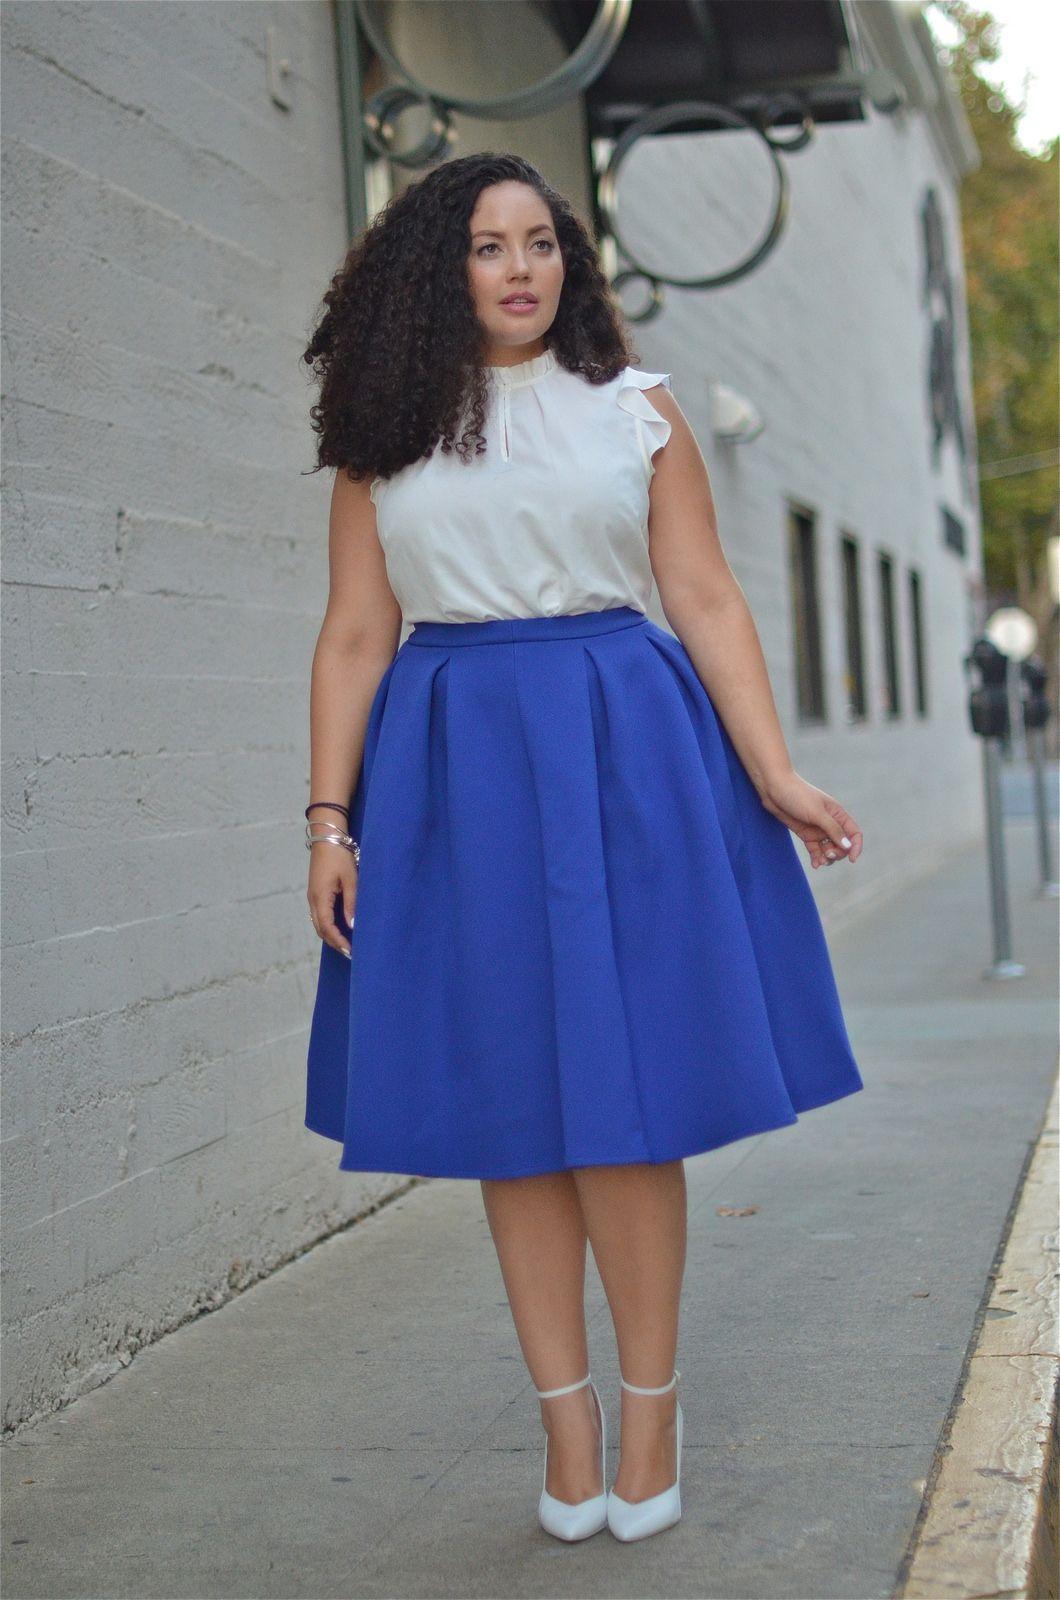 "Foto: Reprodução / <a href=""http://girlwithcurves.com/post/100465802897/faux-paux"" target=""_blank"">Girl with curves</a>"